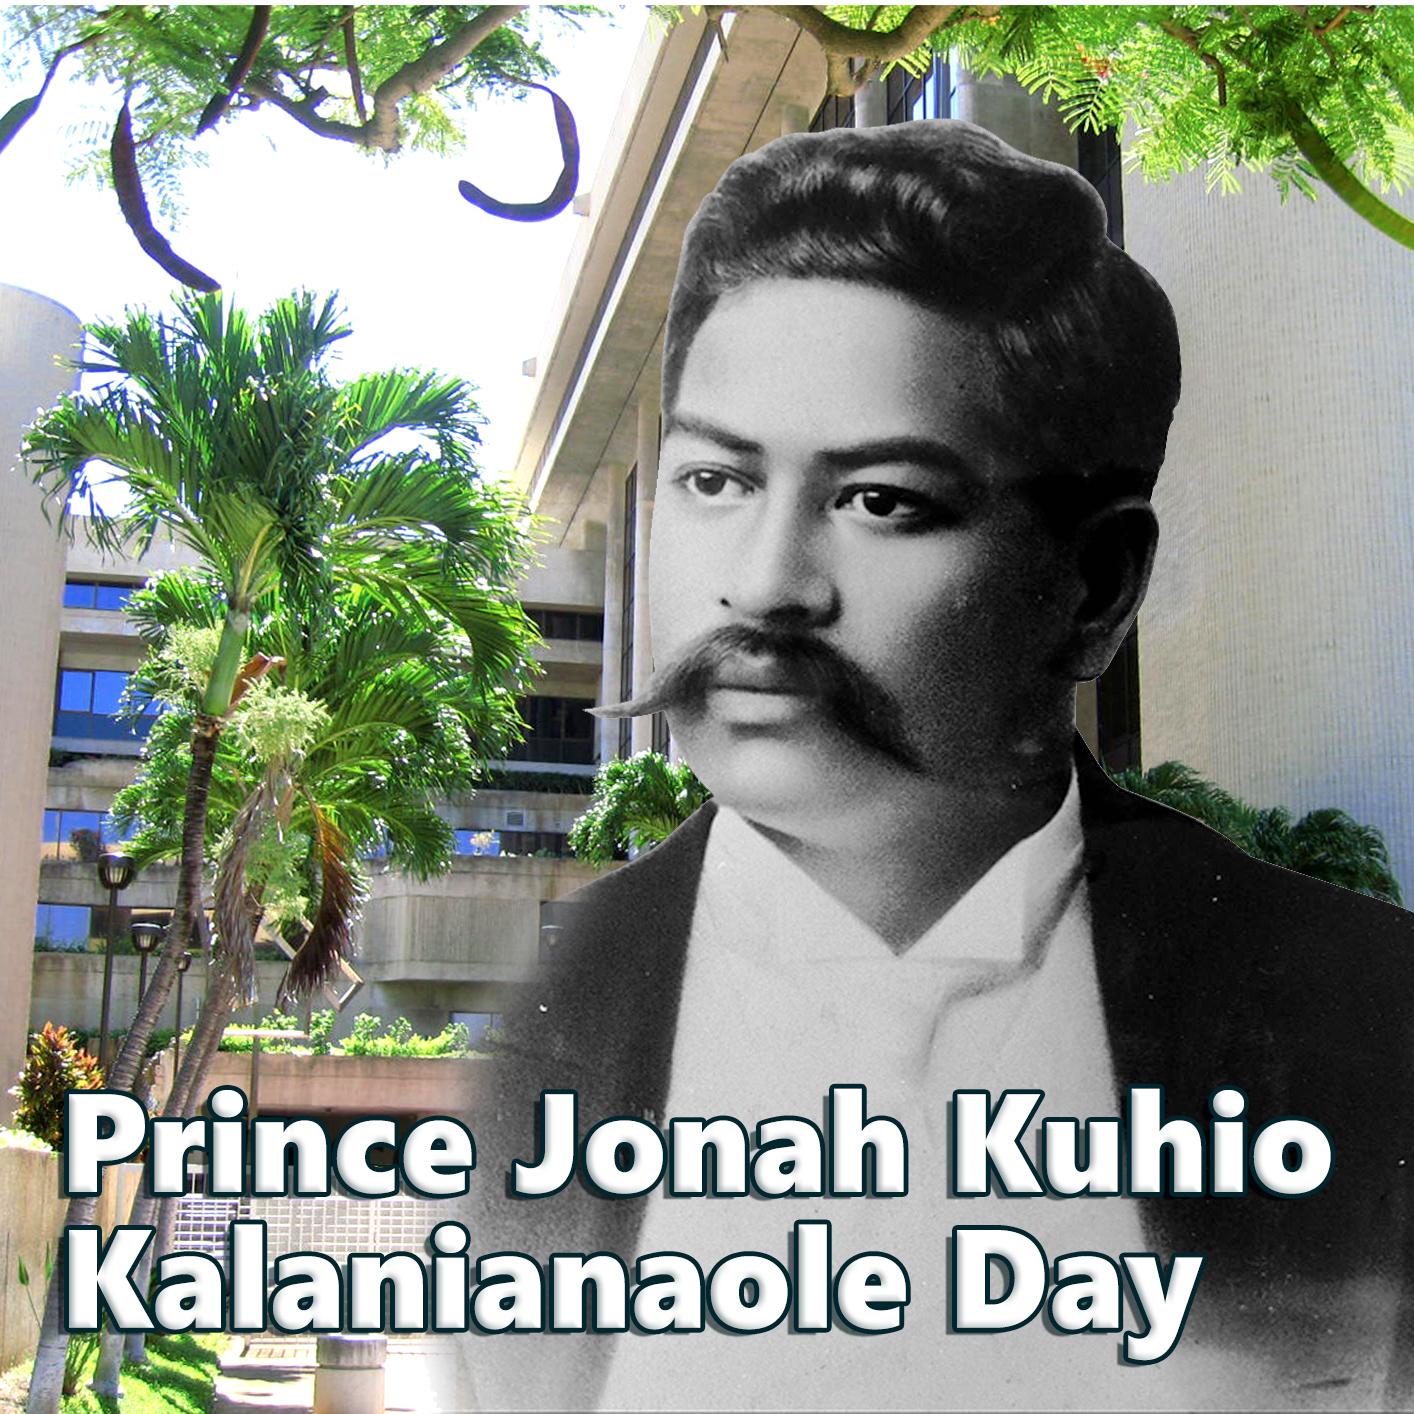 Prince Jonah Kuhio Kalanianaole Day